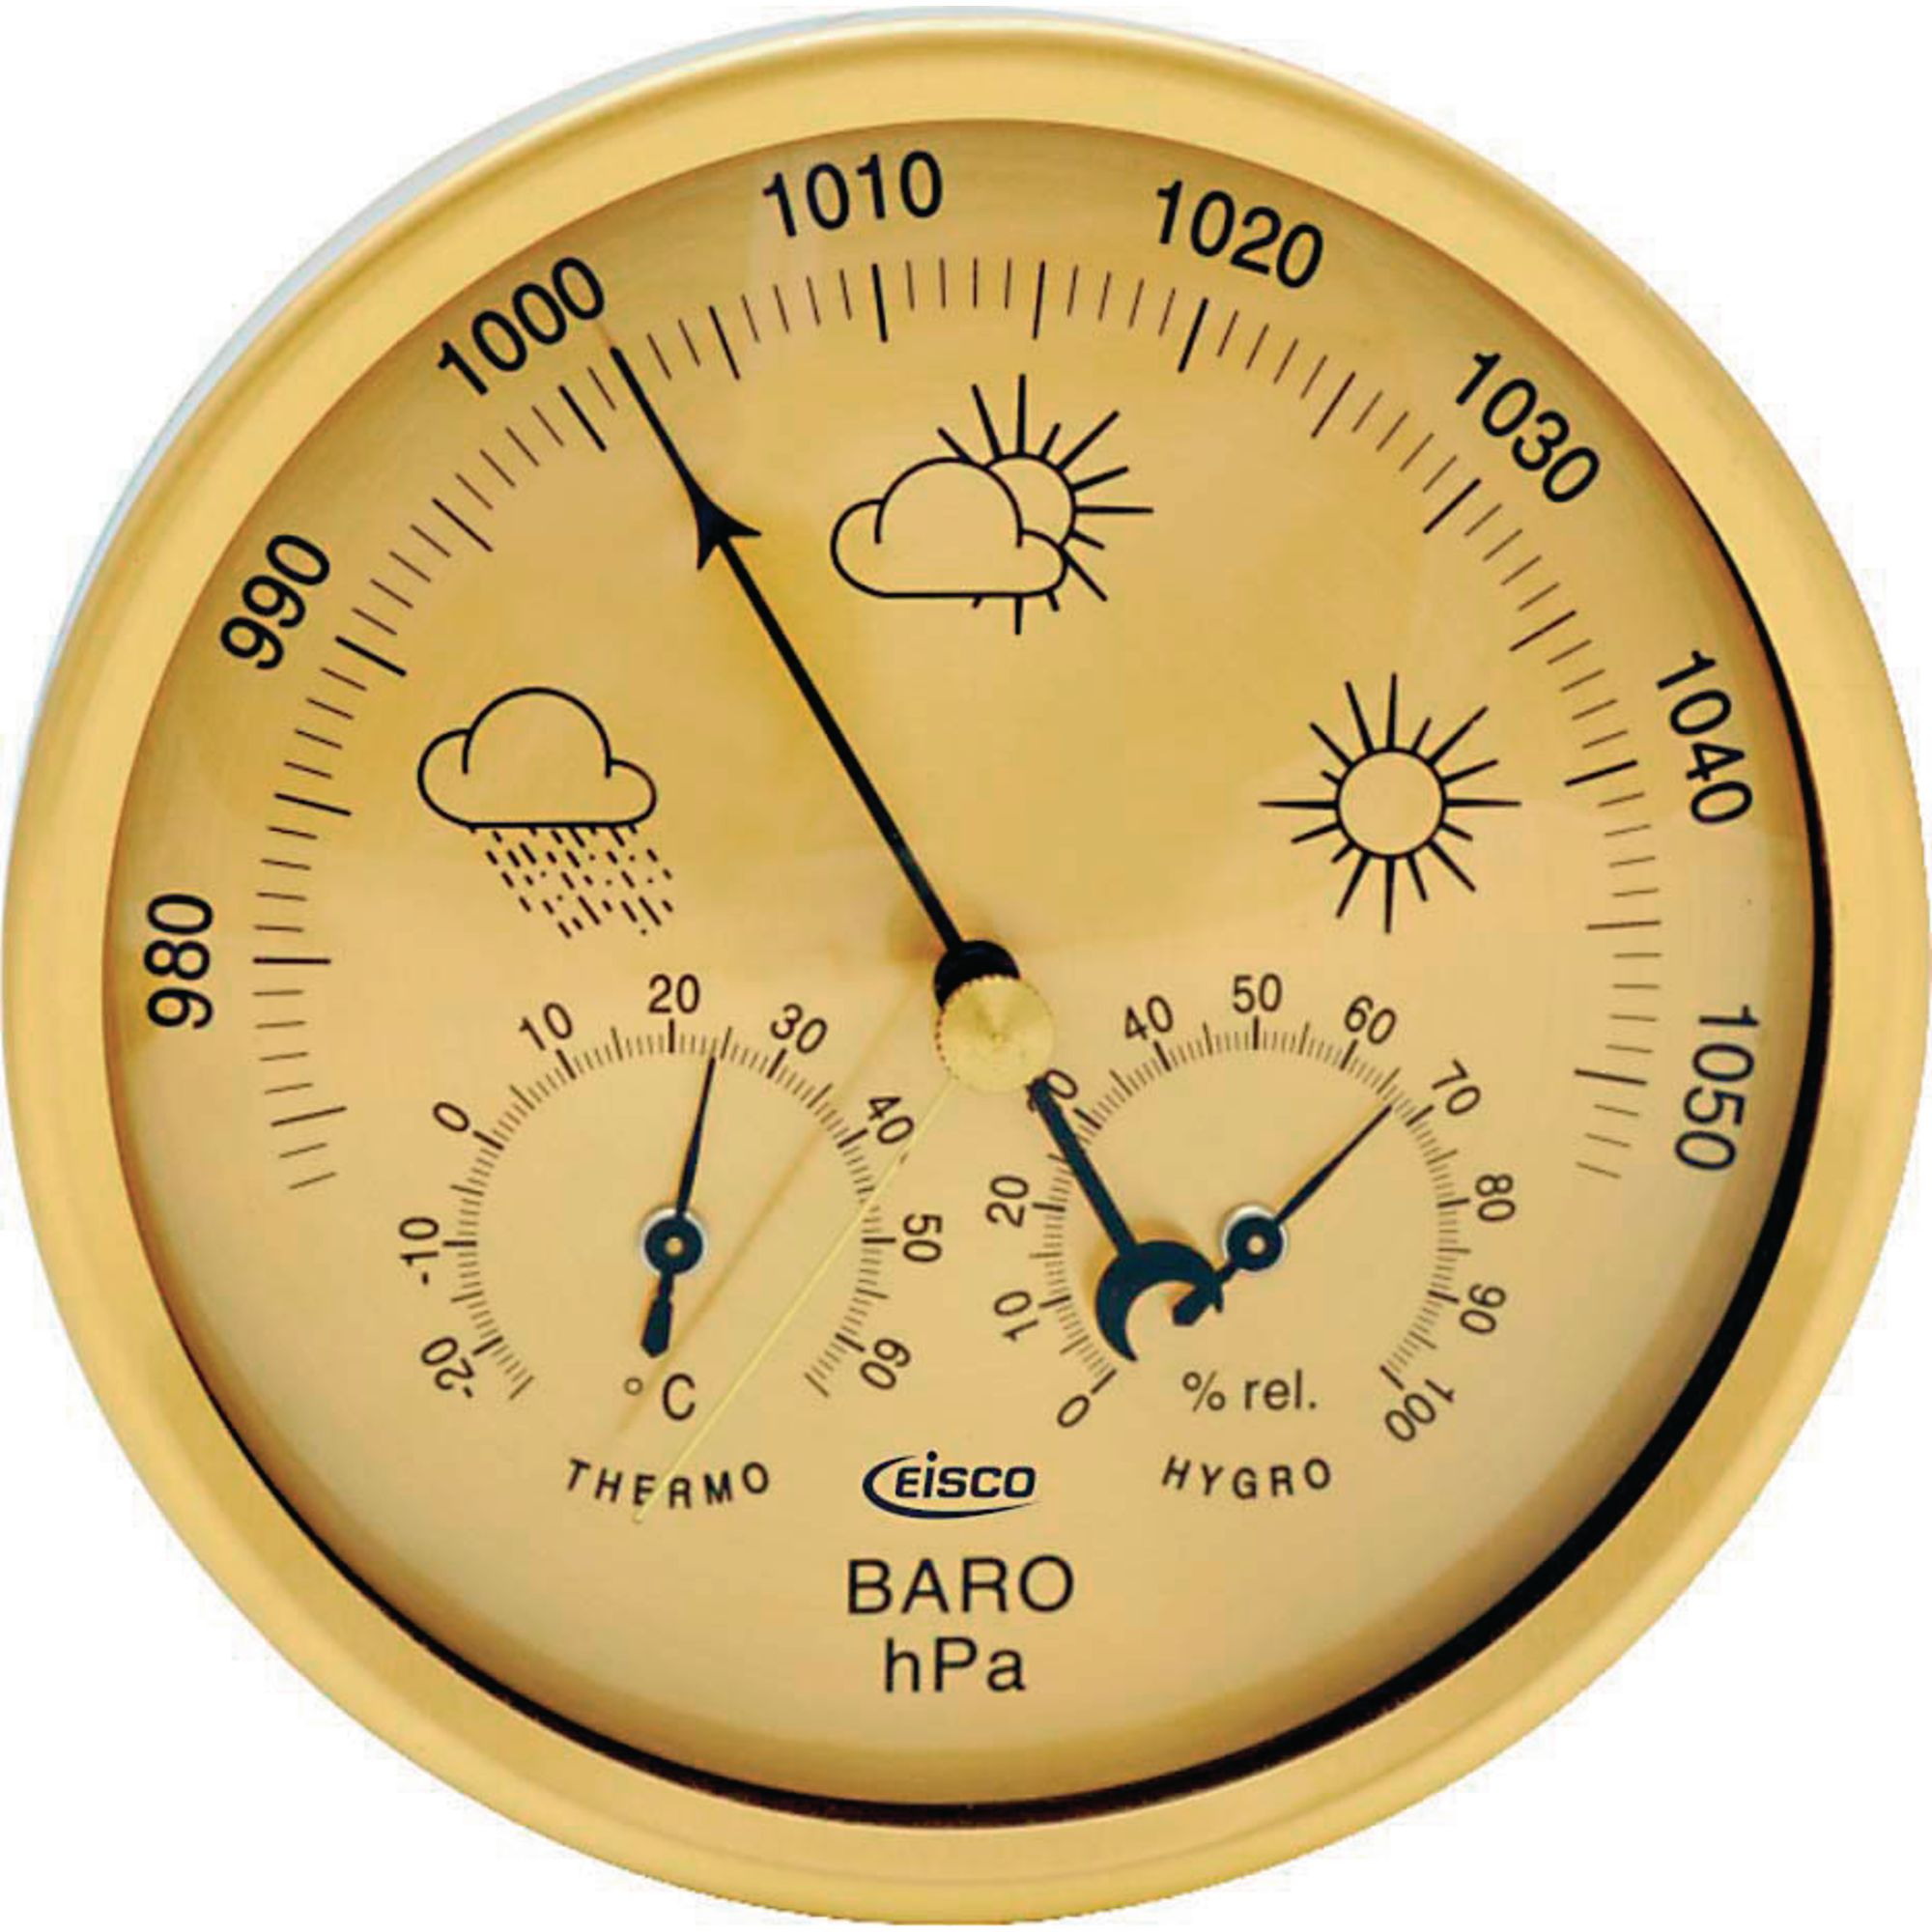 Barometer Hope Education